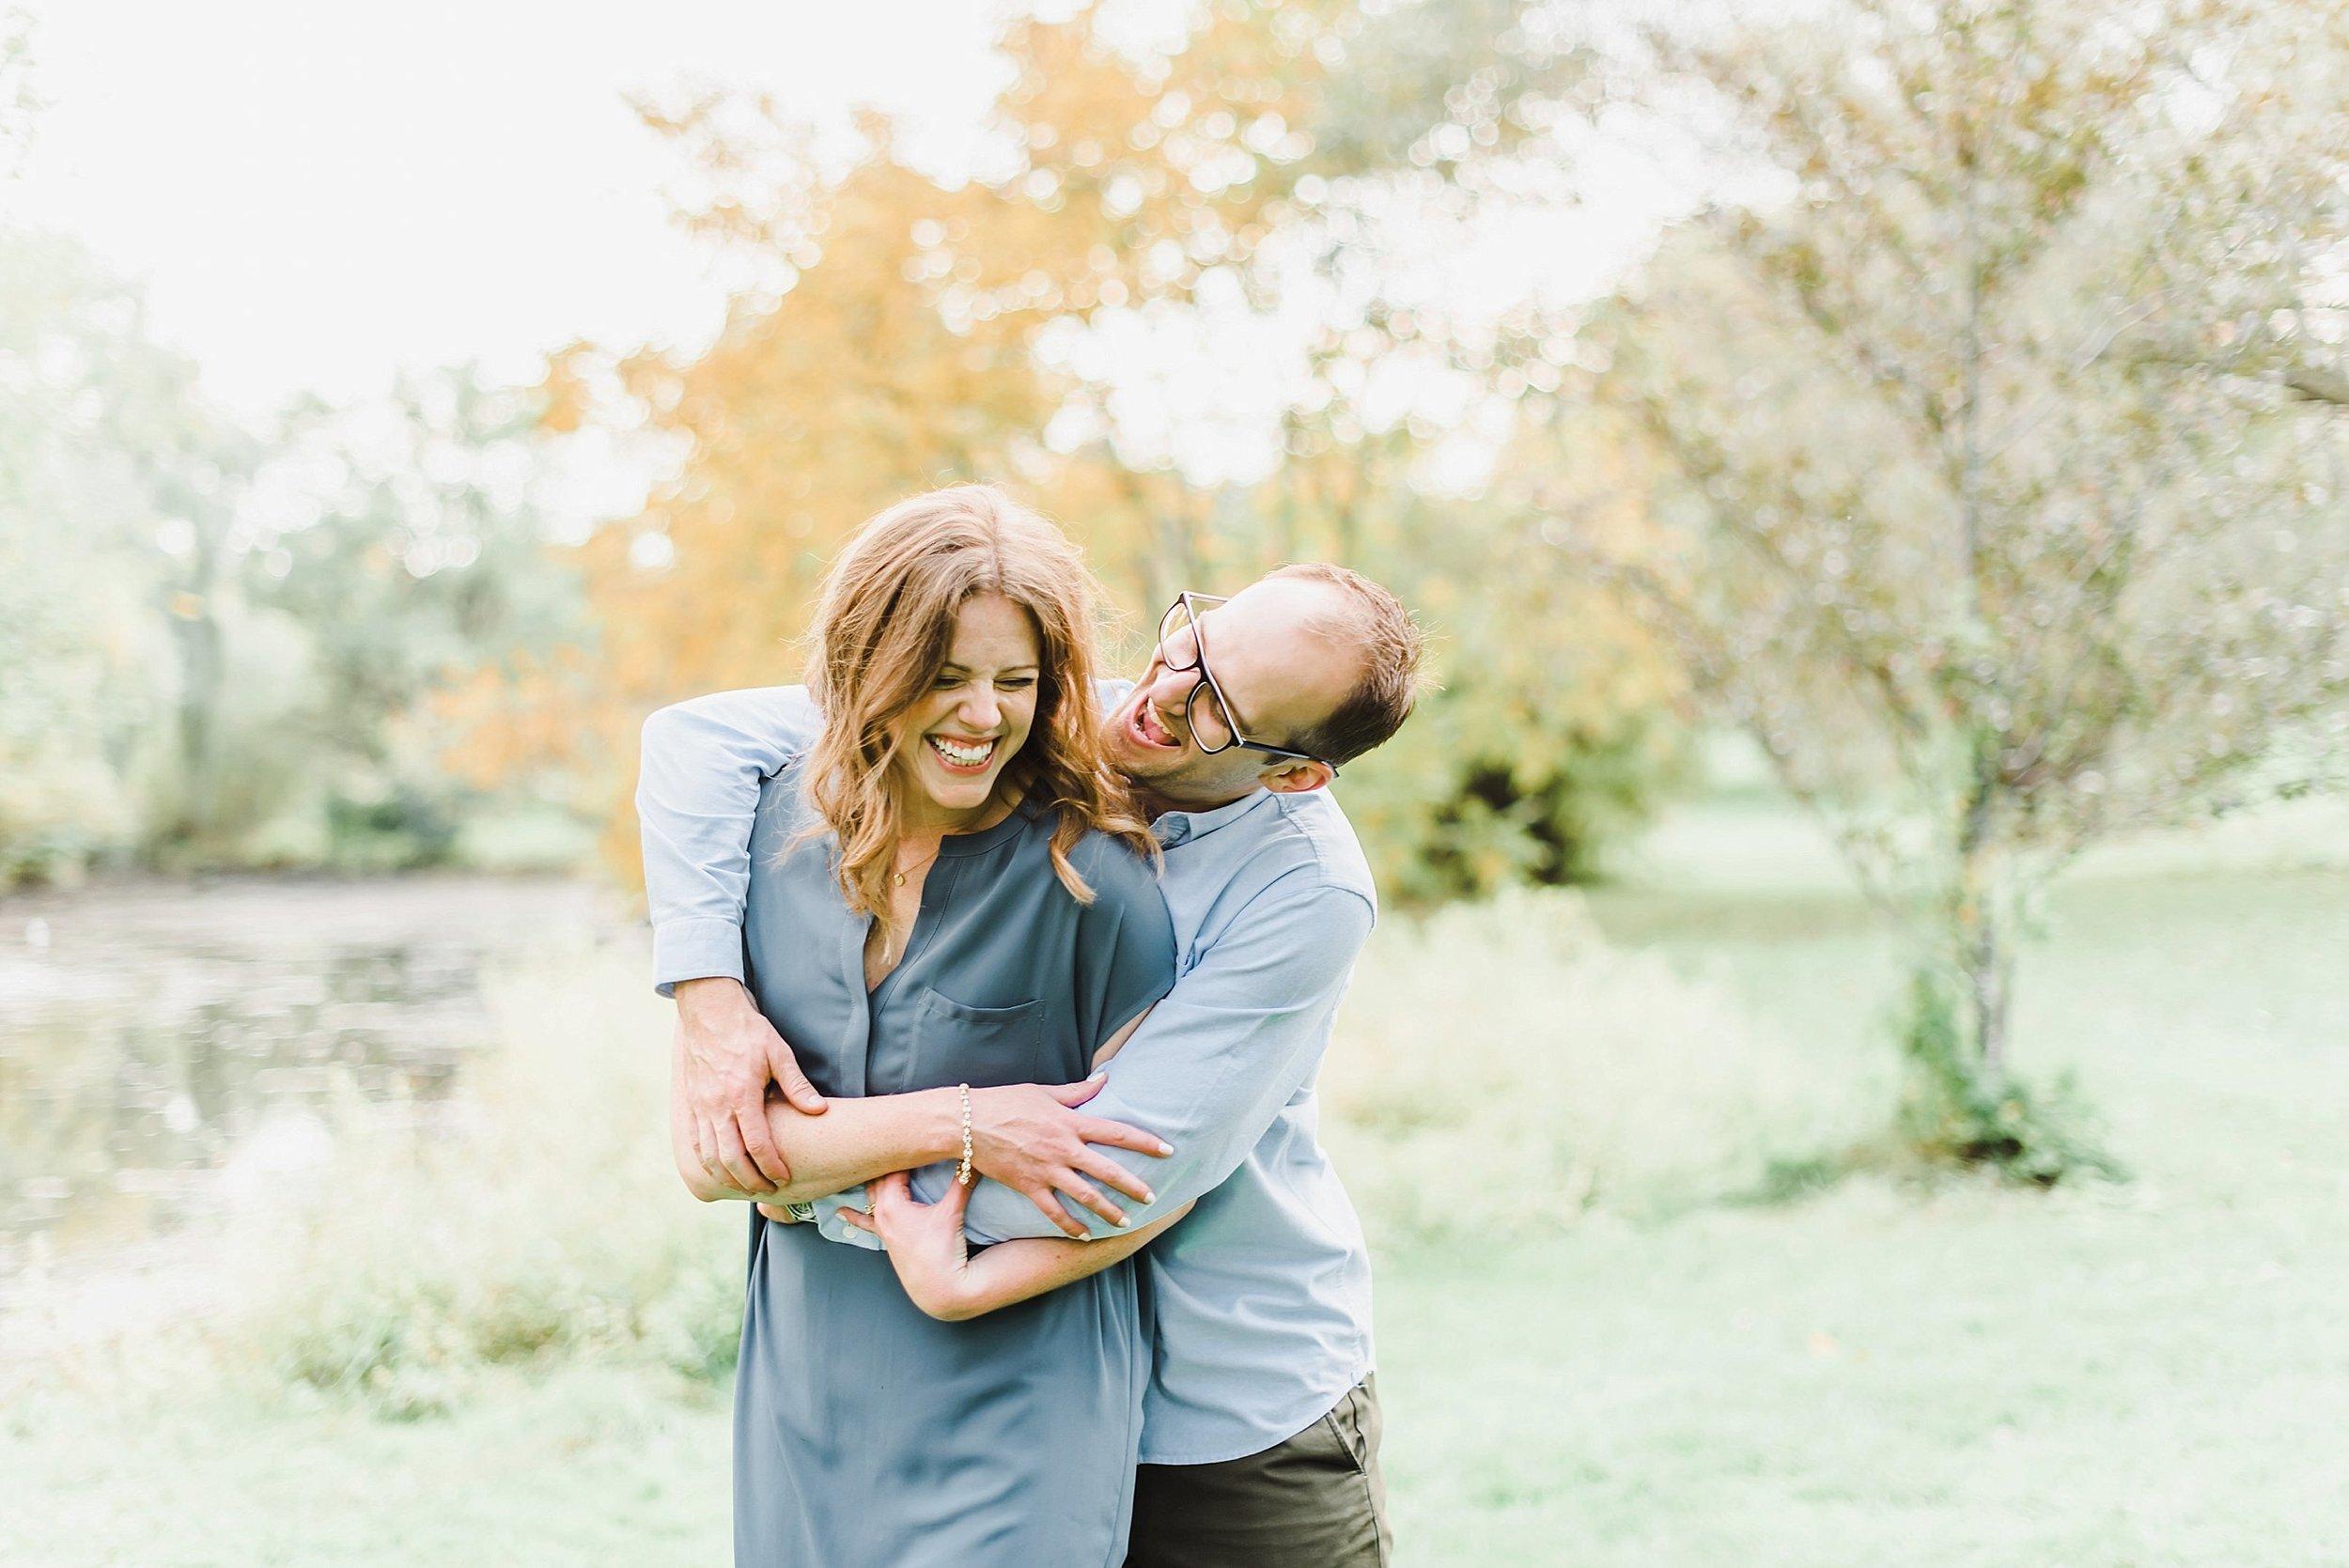 light airy indie fine art ottawa wedding photographer | Ali and Batoul Photography_1412.jpg